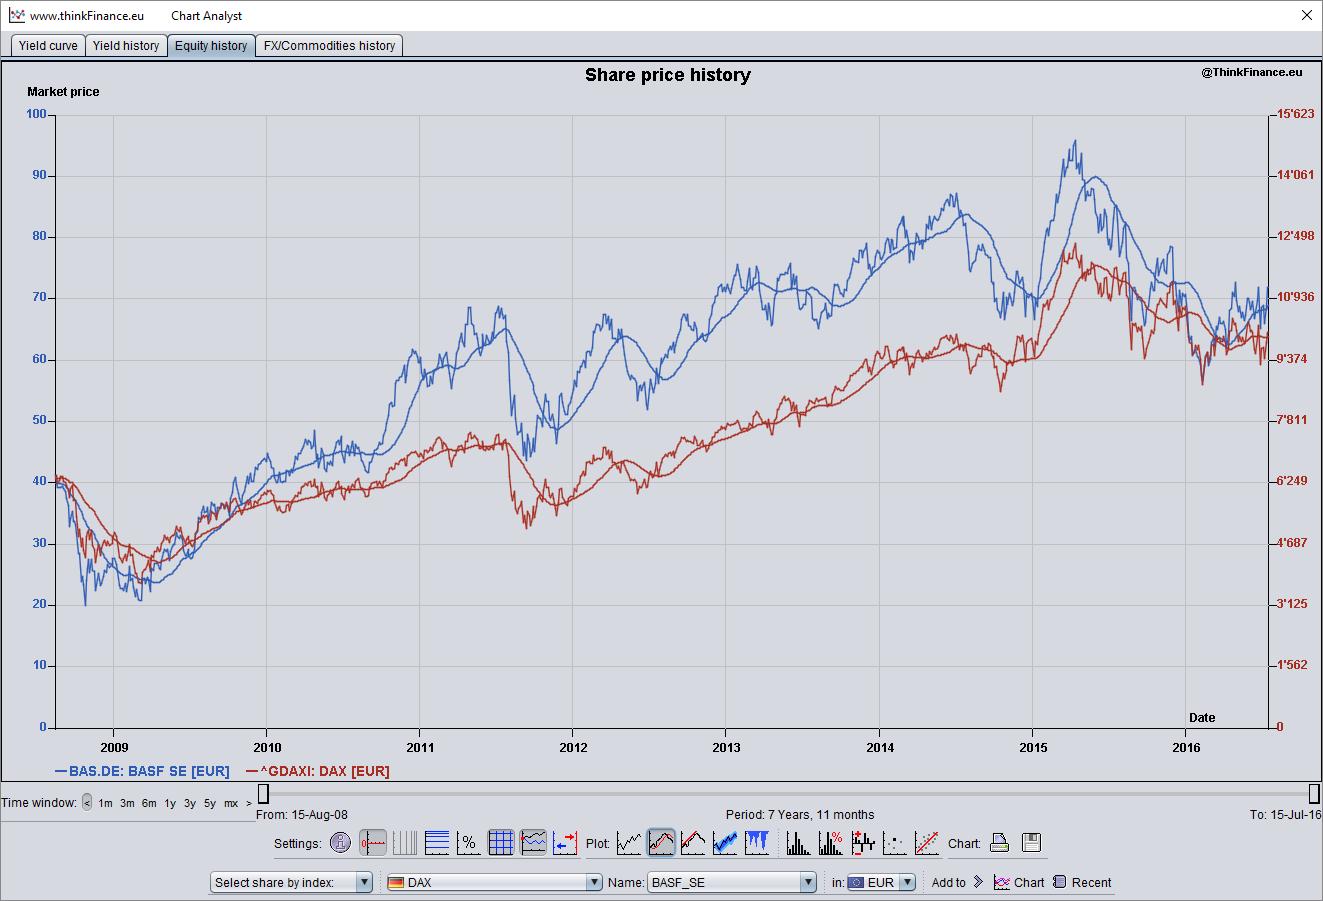 Historical-data-analysis